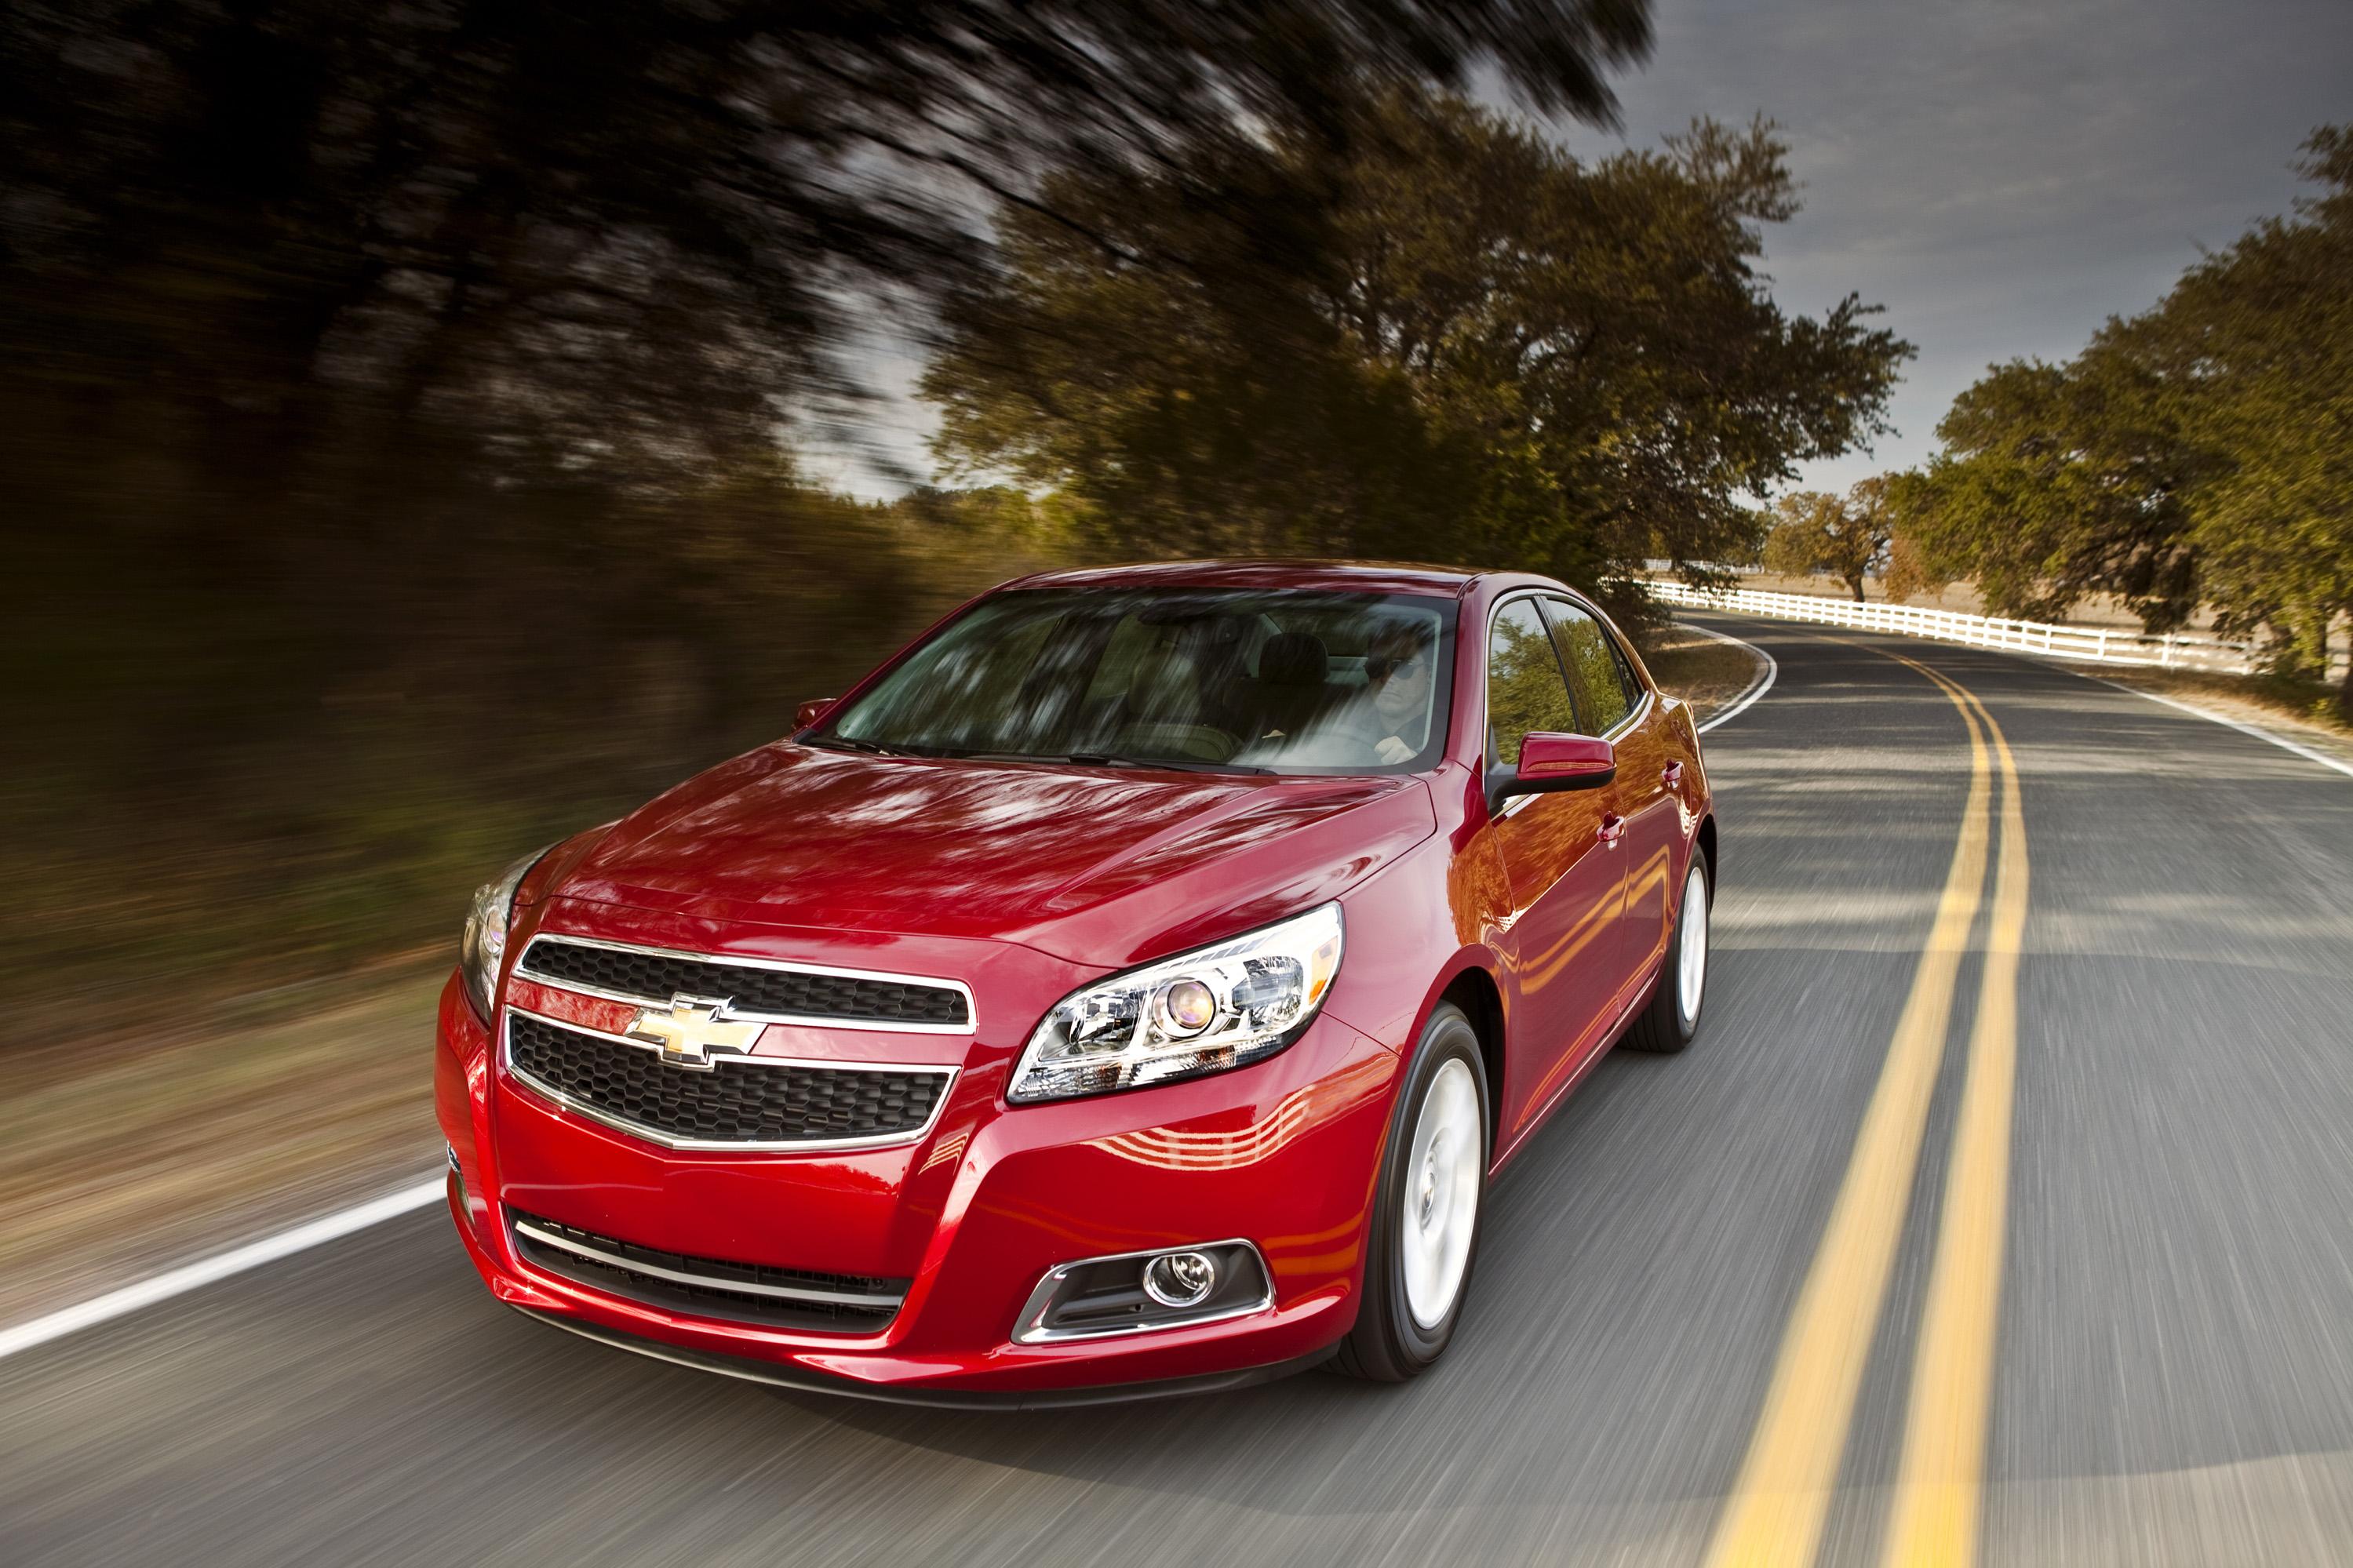 GM has high hopes for eAssist - GM-VOLT : Chevy Volt